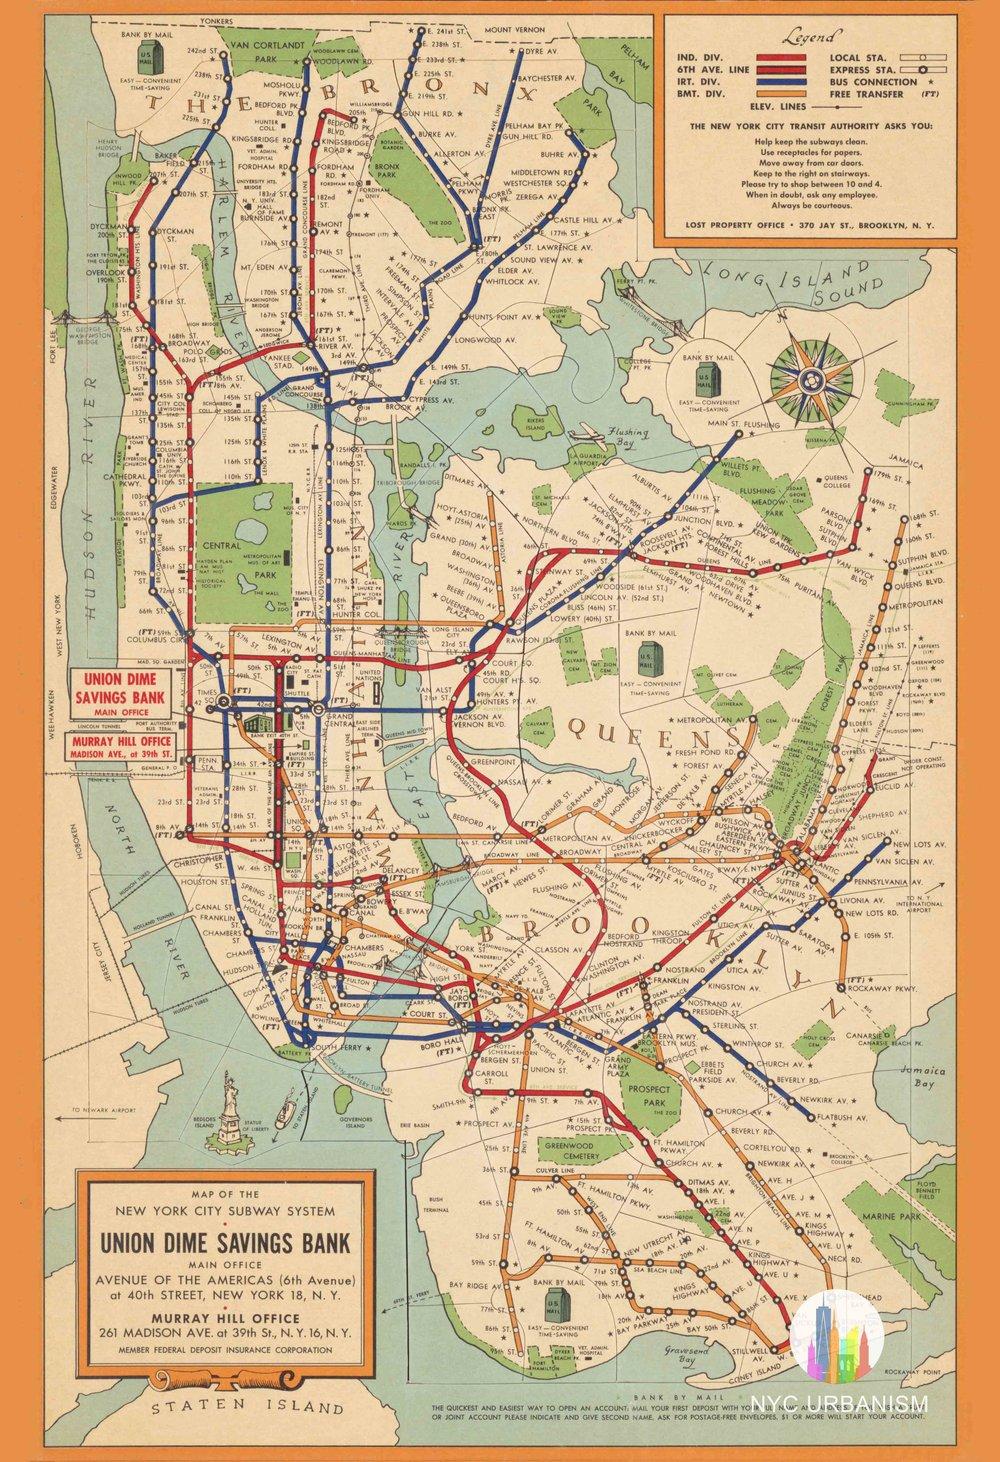 Nr Subway Map.1954 Subway Map Nyc Urbanism